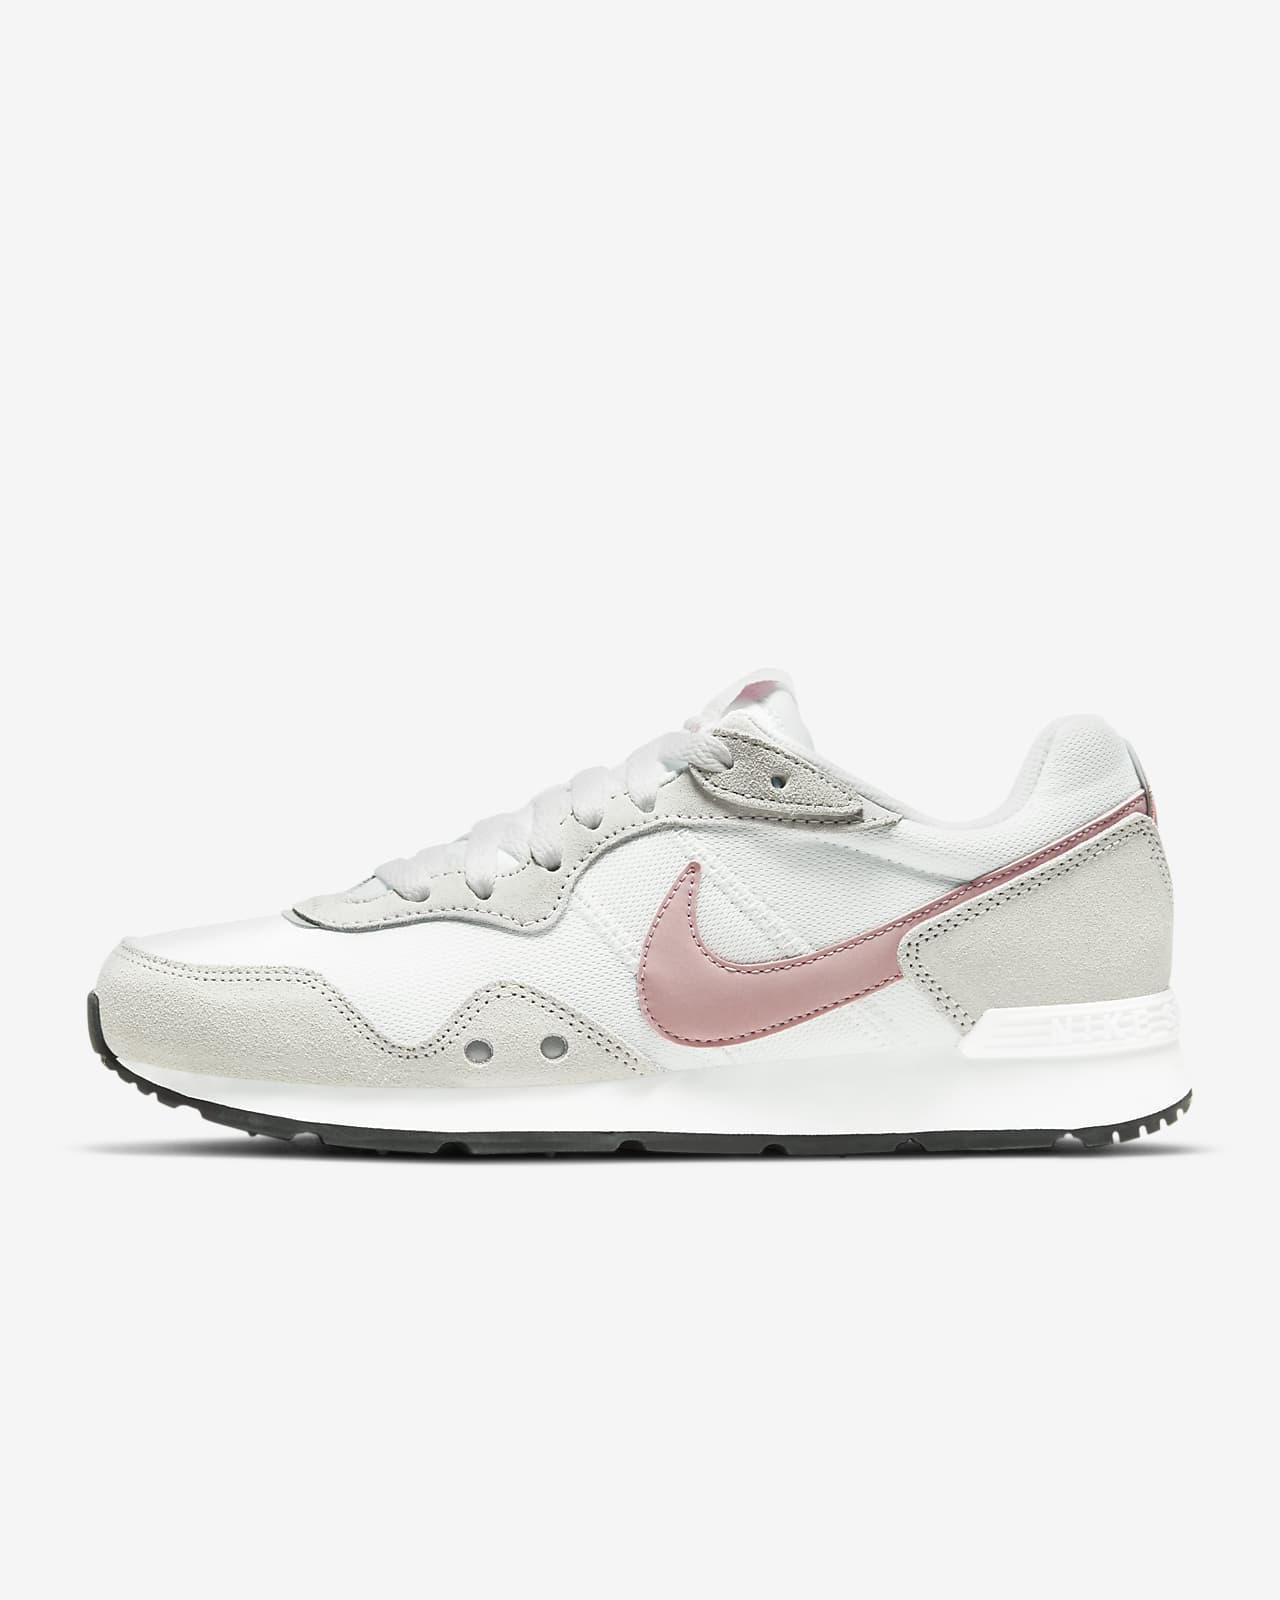 Chaussure Nike Venture Runner pour Femme